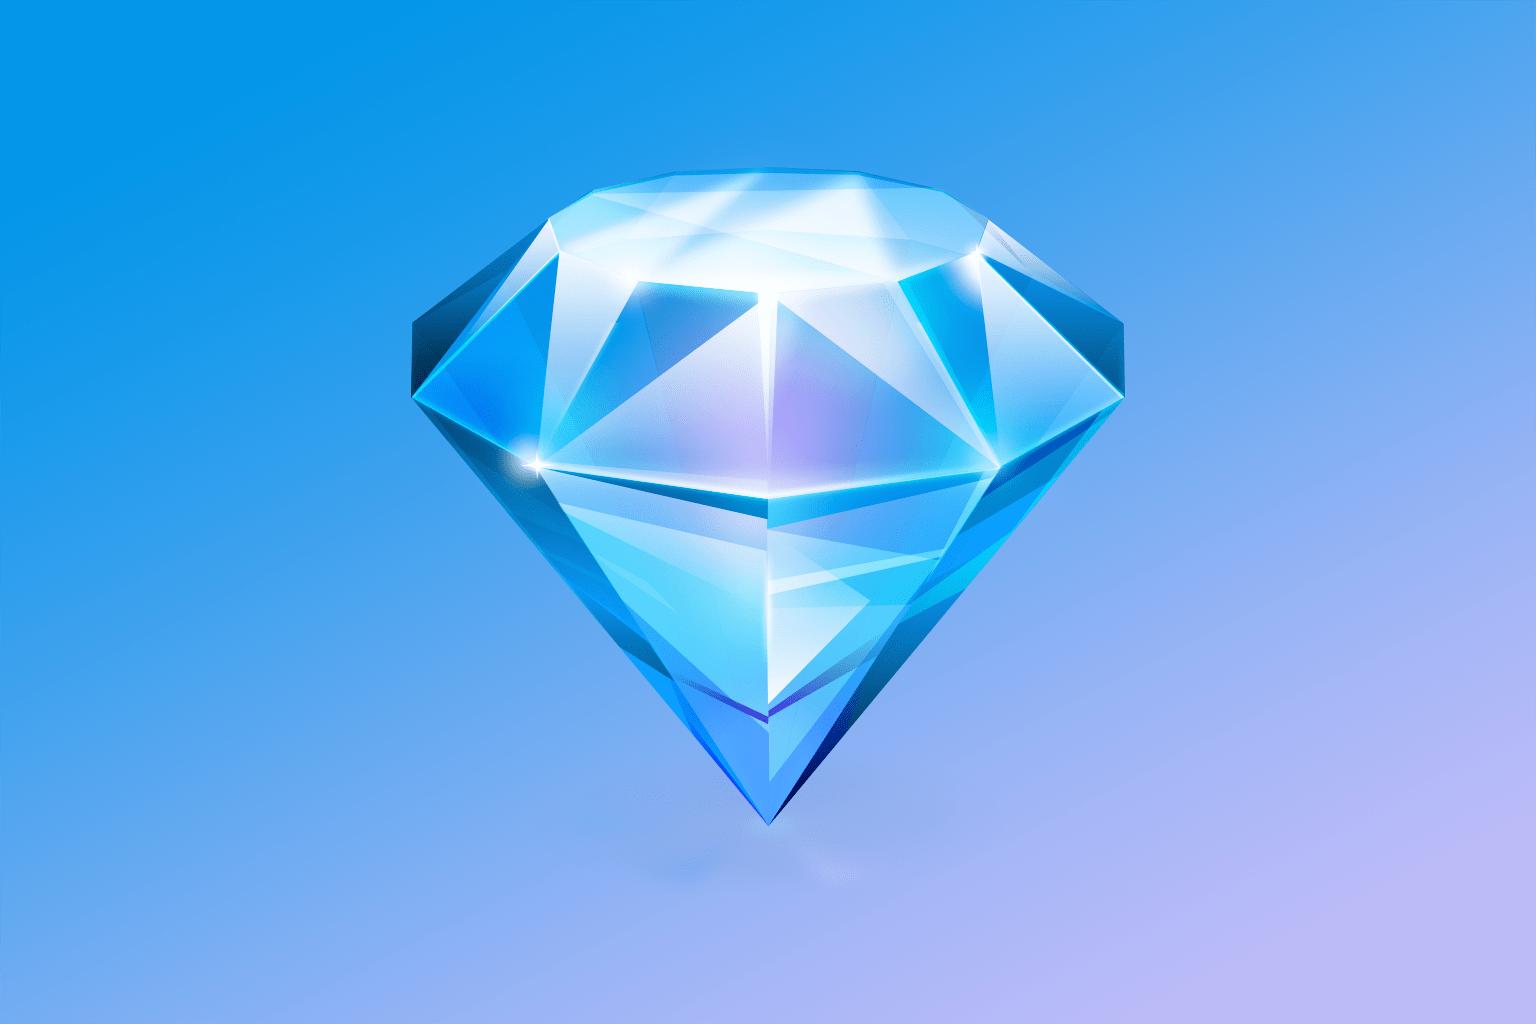 A blue version of the original Sketch 1.0 icon